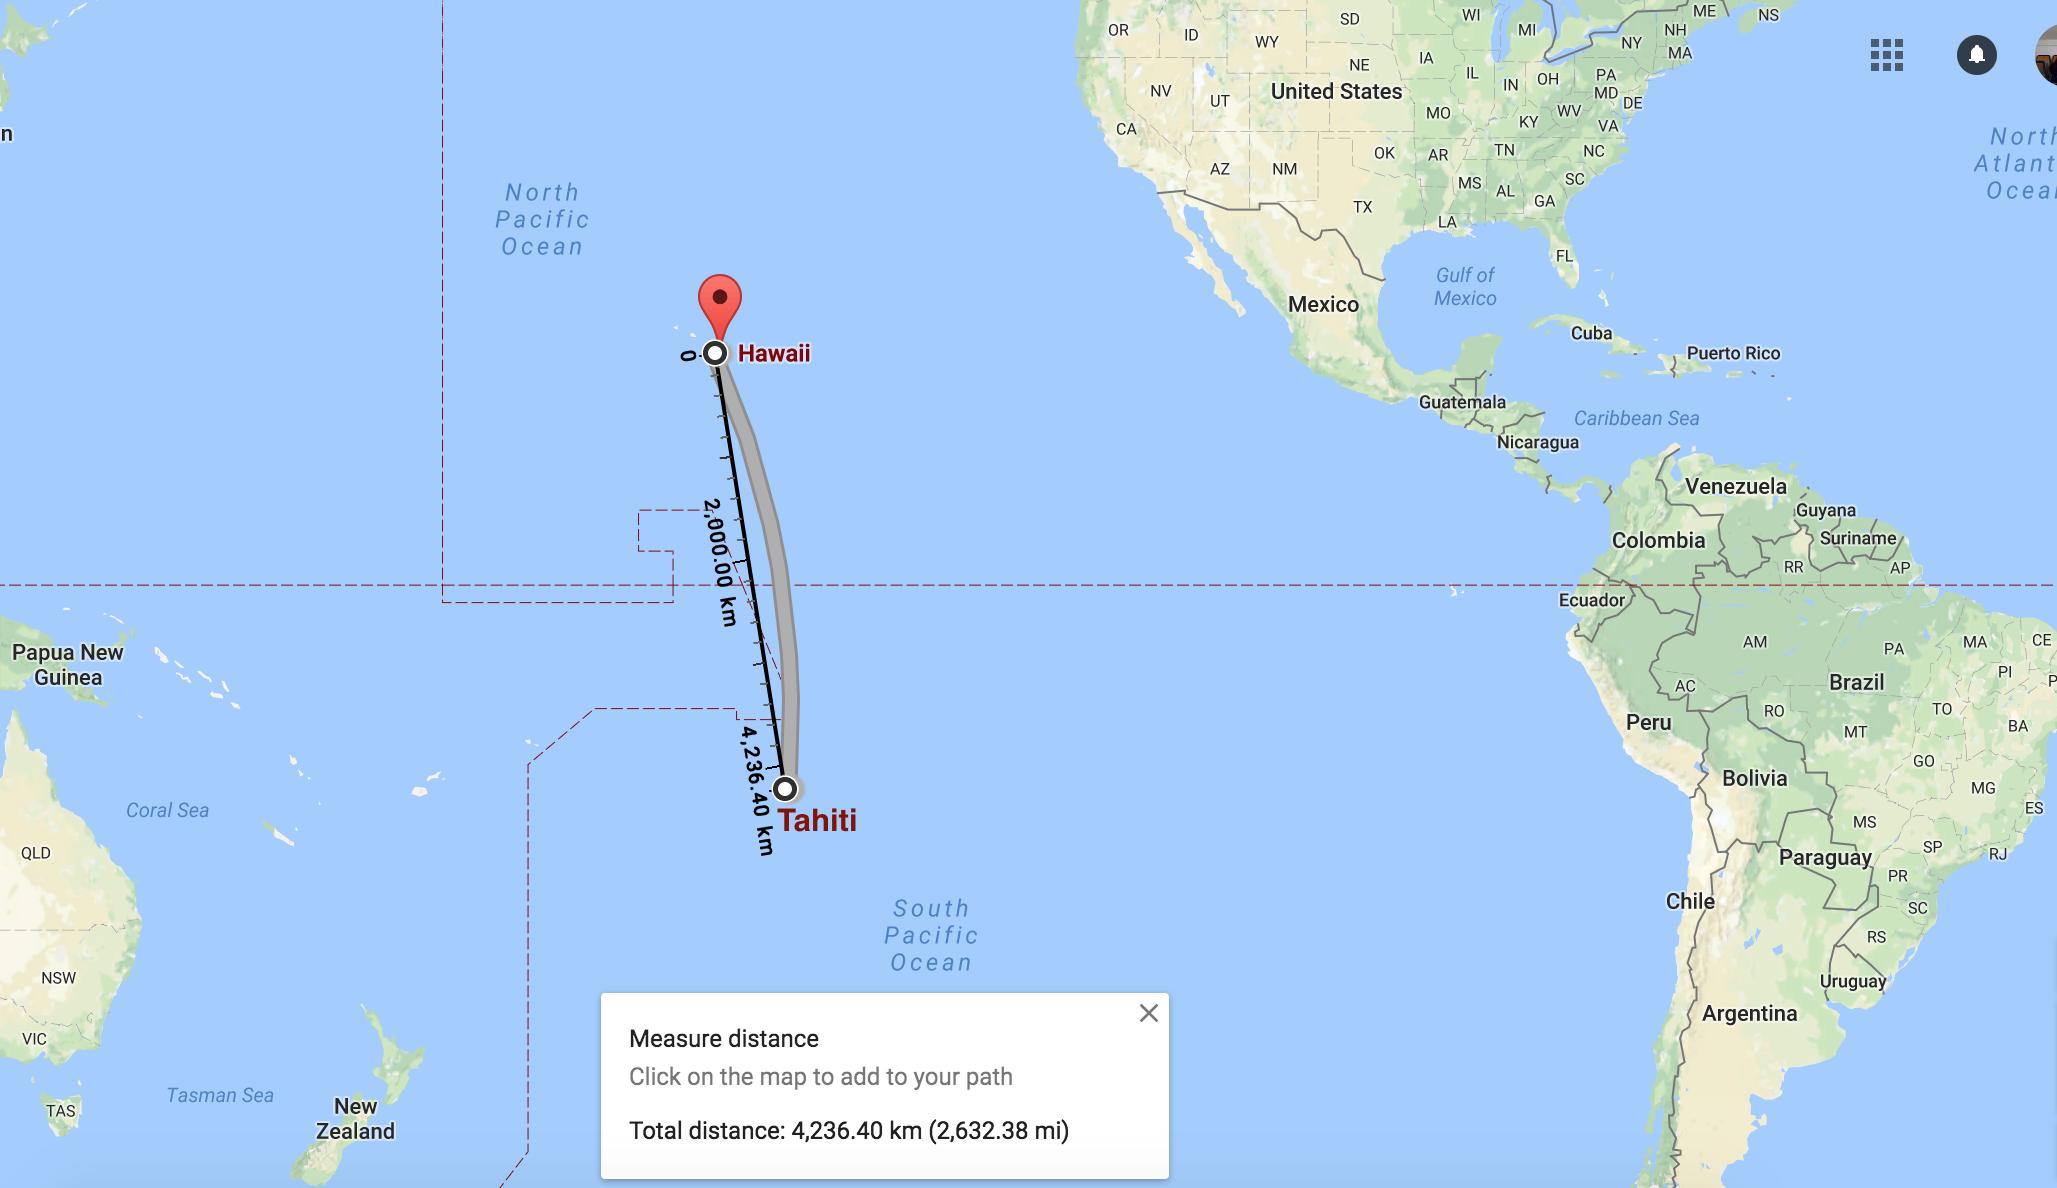 Distance between Hawaii and Tahiti (Screen capture of Google Map)